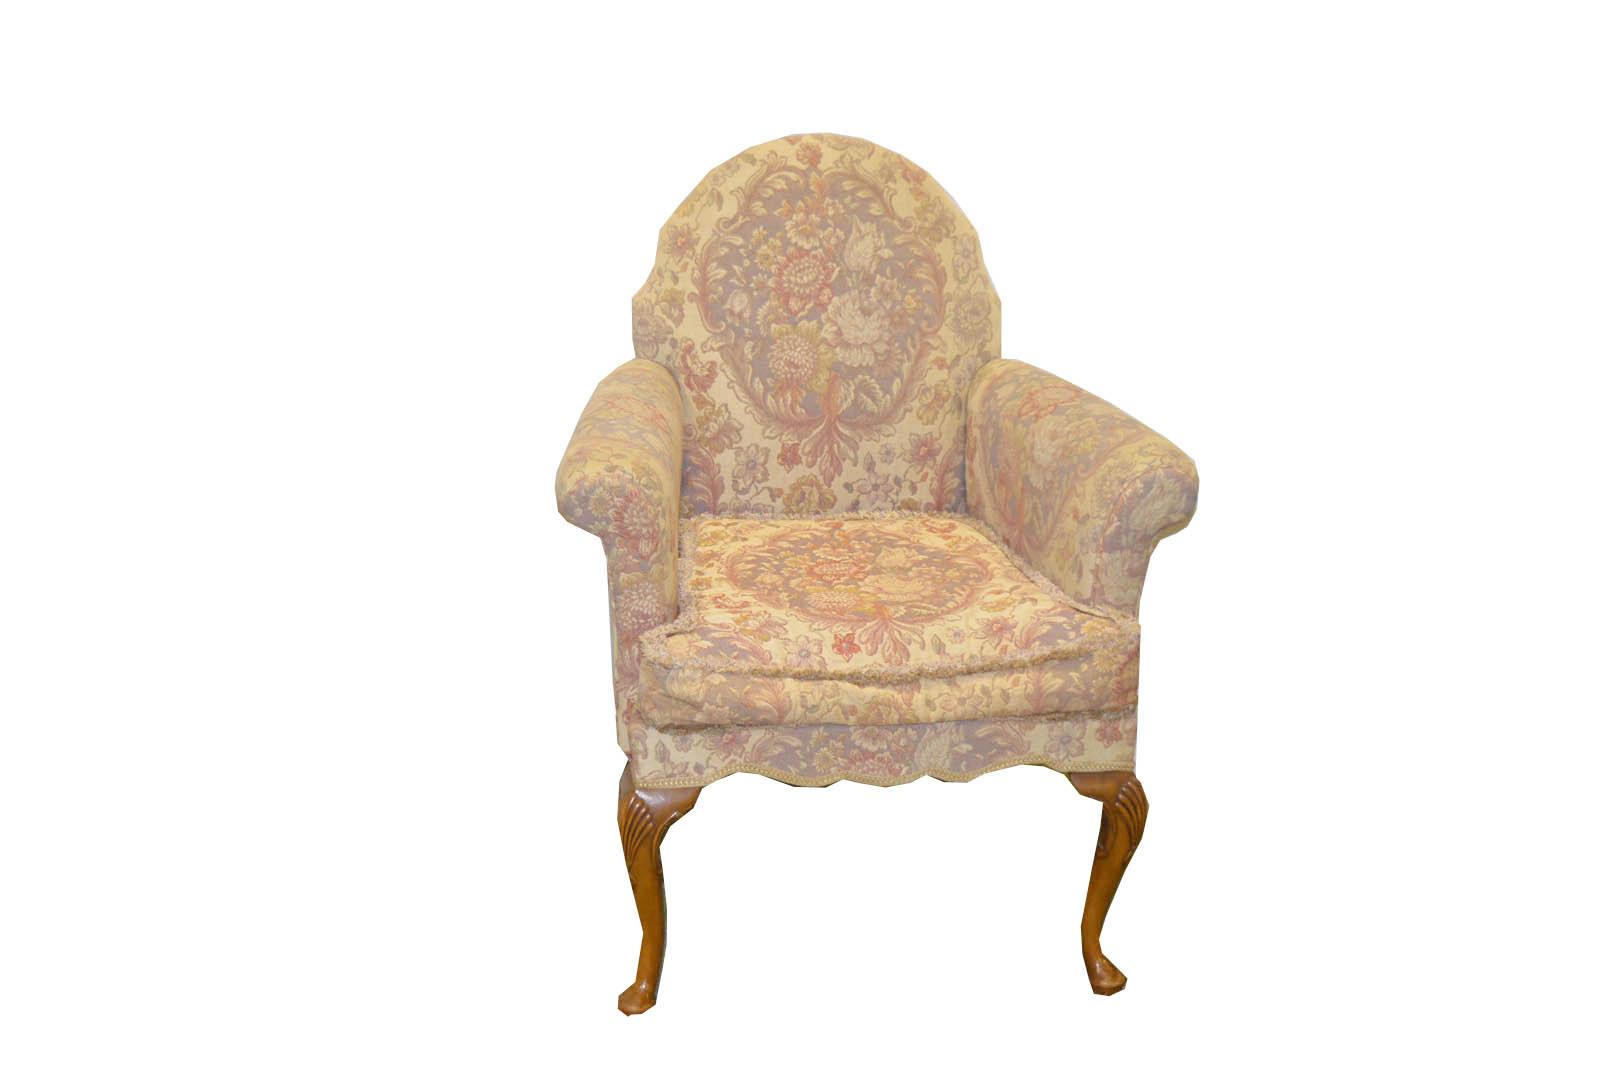 Lot 45 - A Very Nice Walnut Framed Uphosltered Armchair